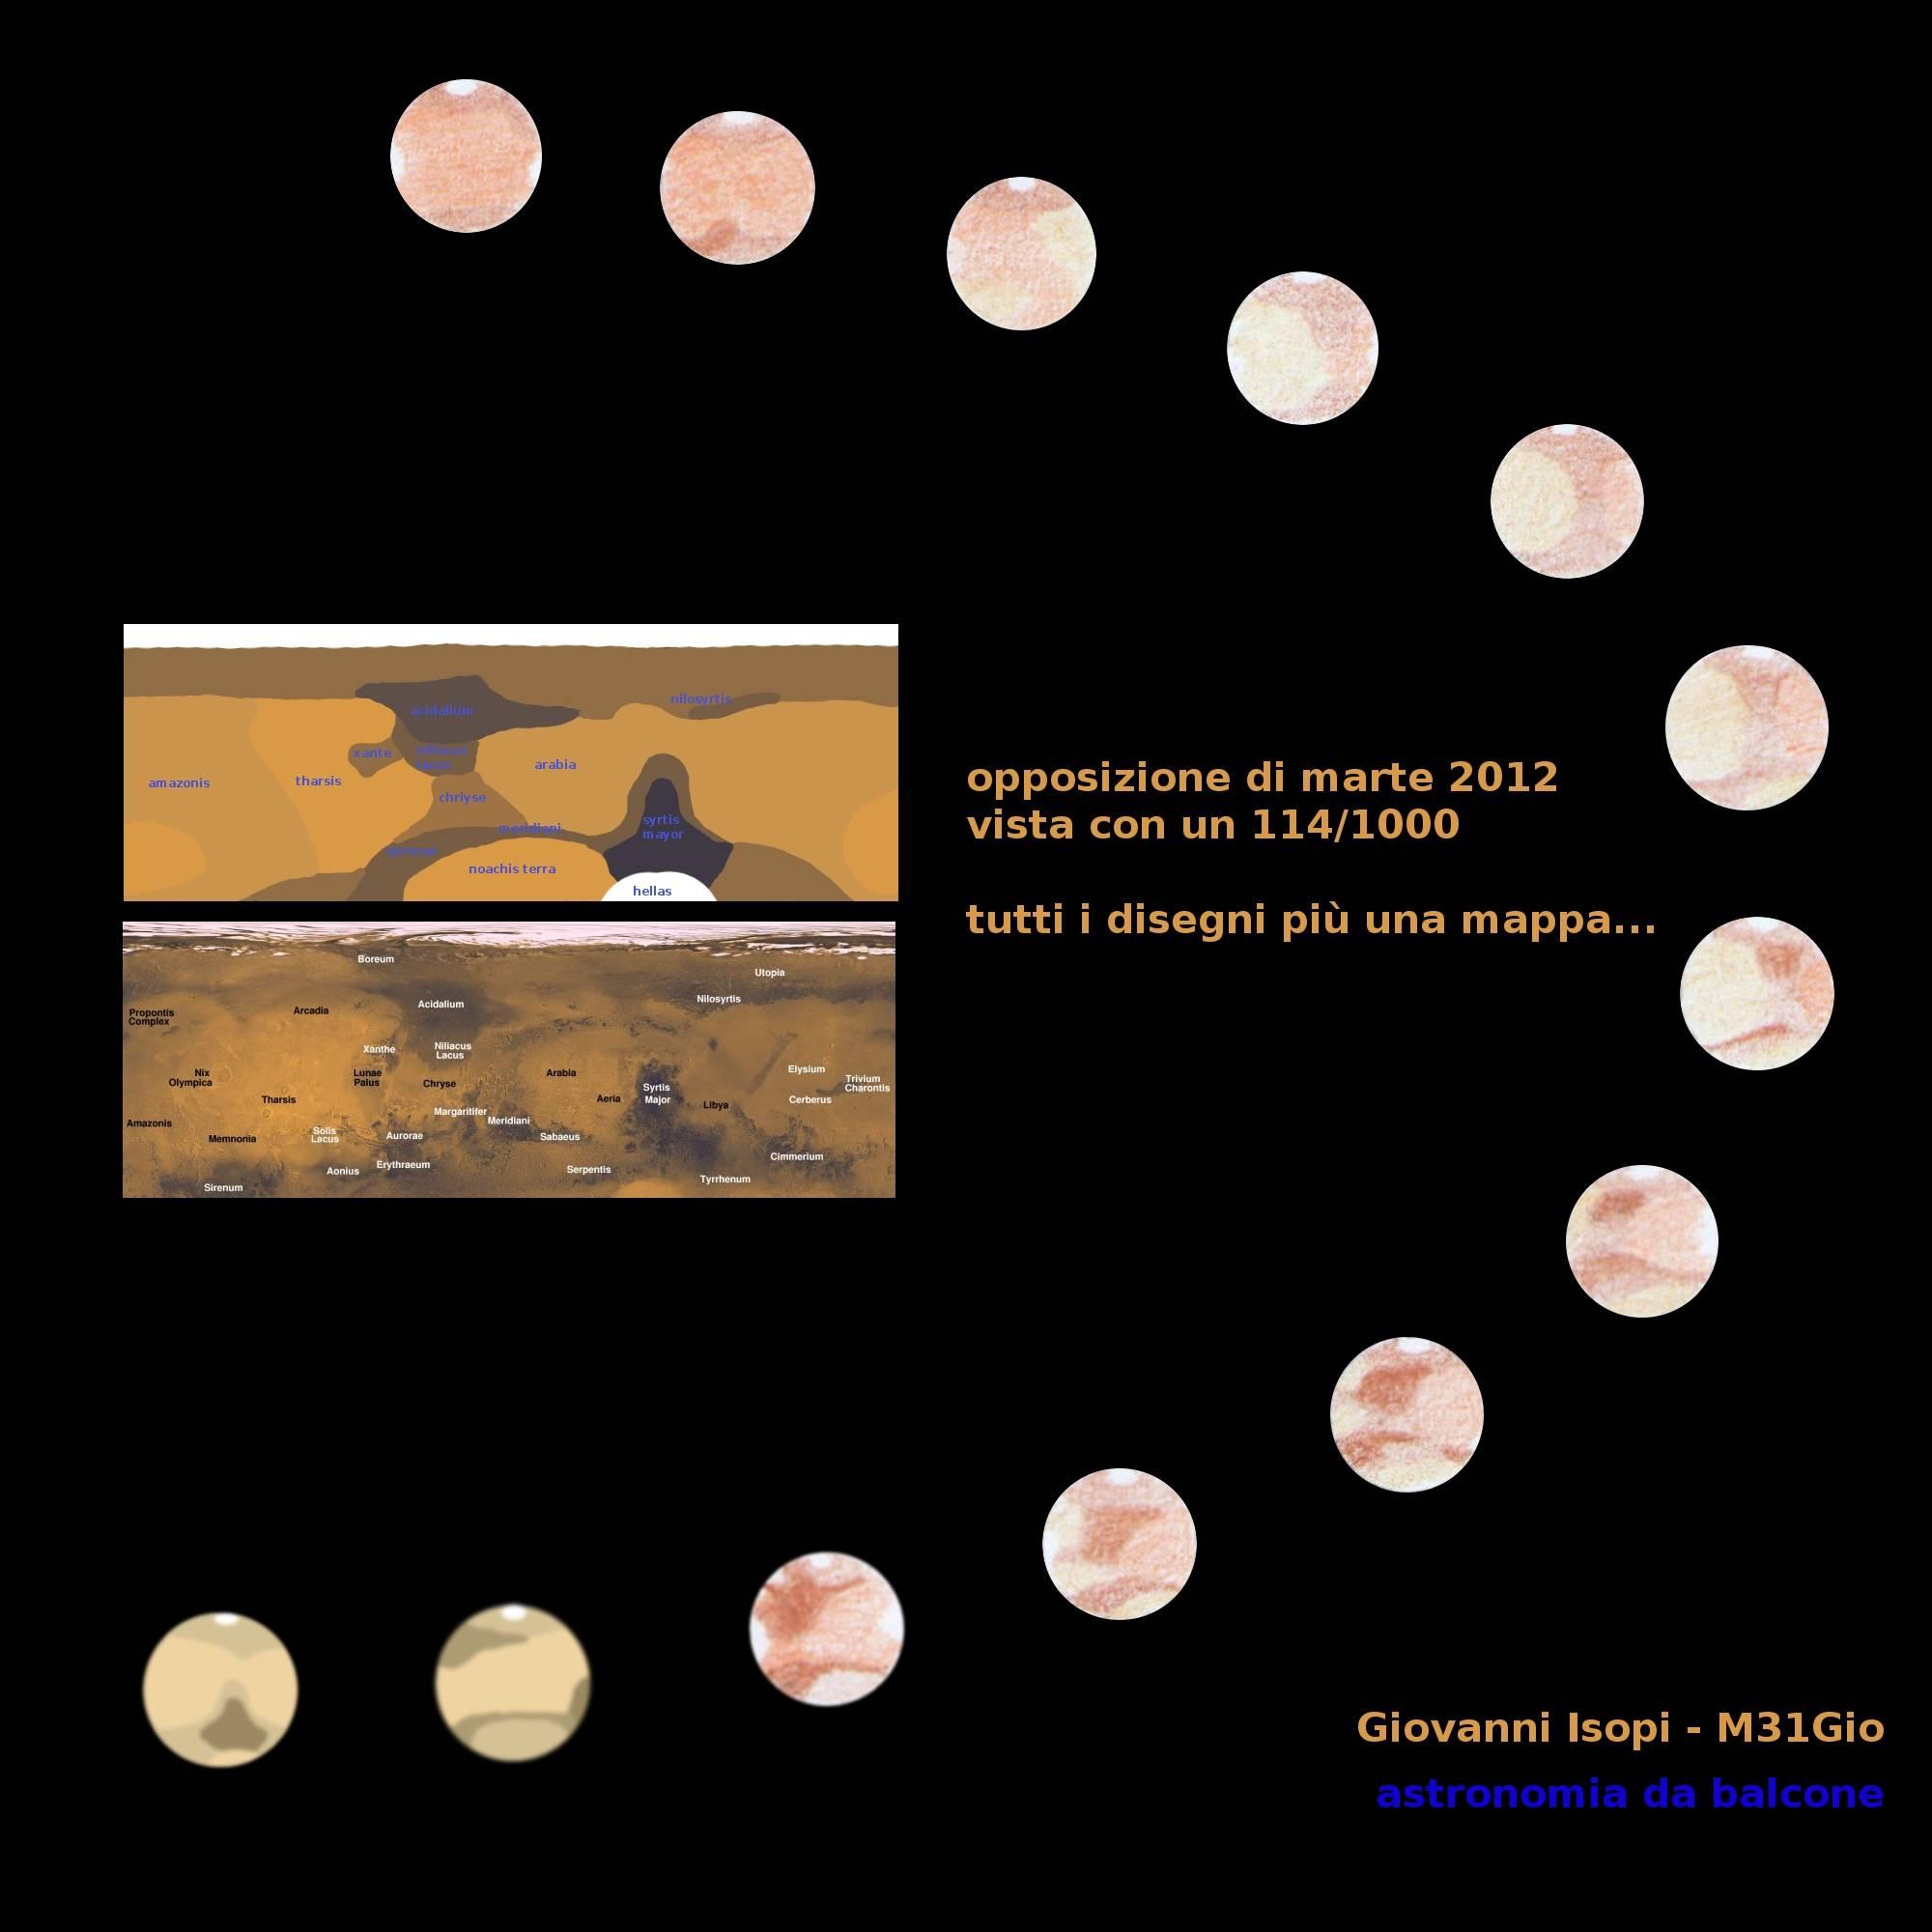 2012 Mars Opposition